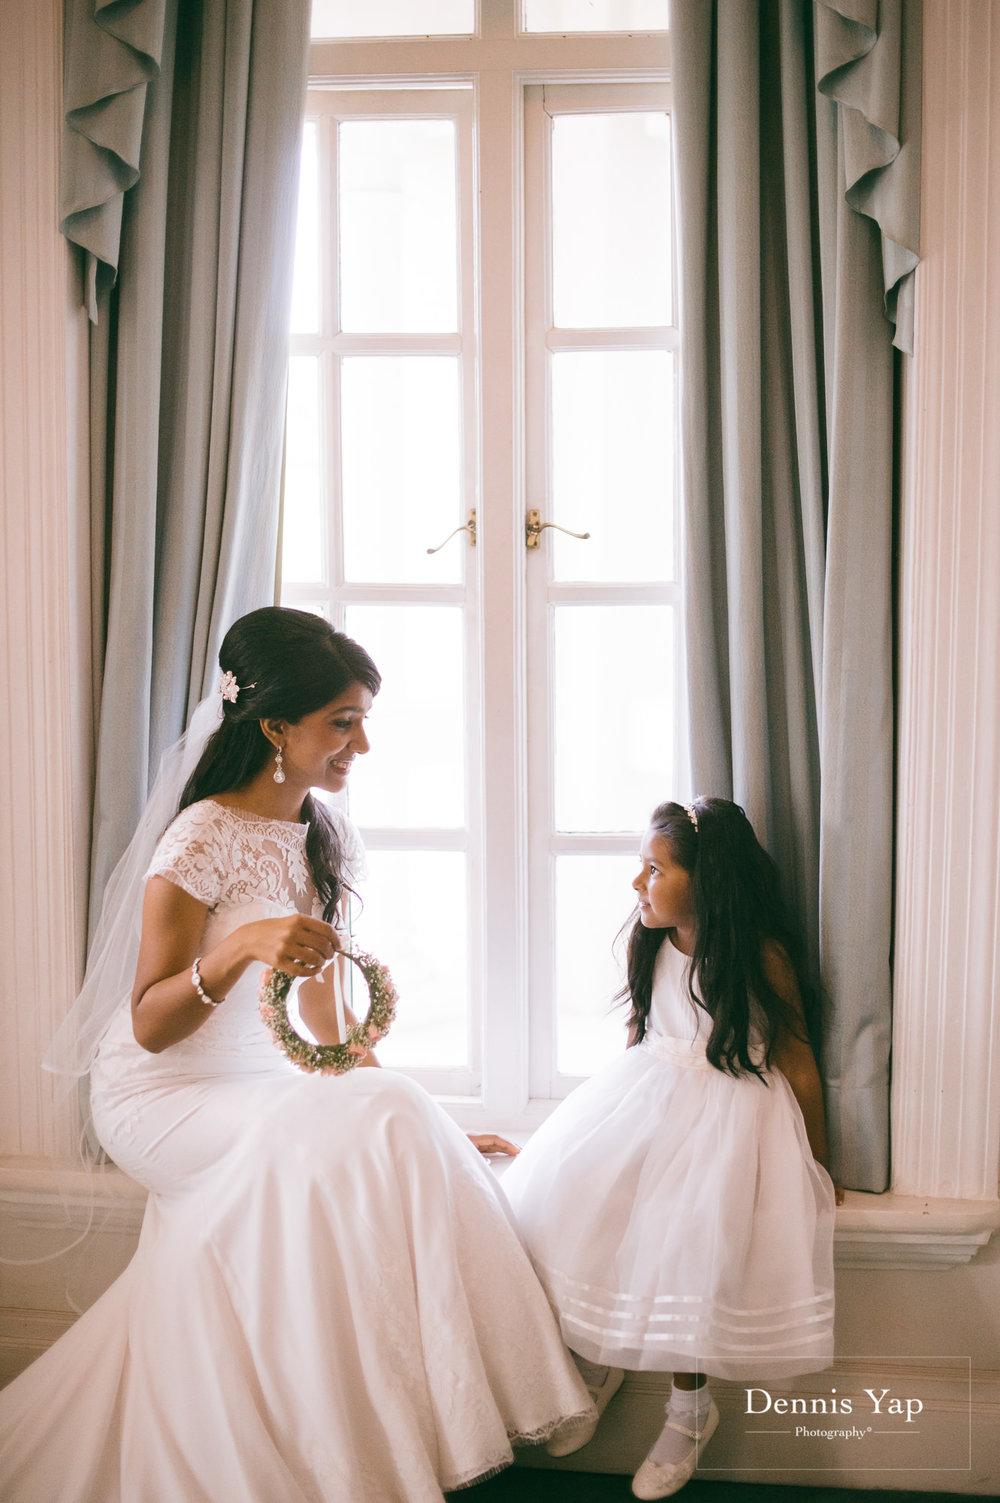 javed zenysha muslim wedding ceremony seri carcosa negara dennis yap photography maldives couple-16.jpg